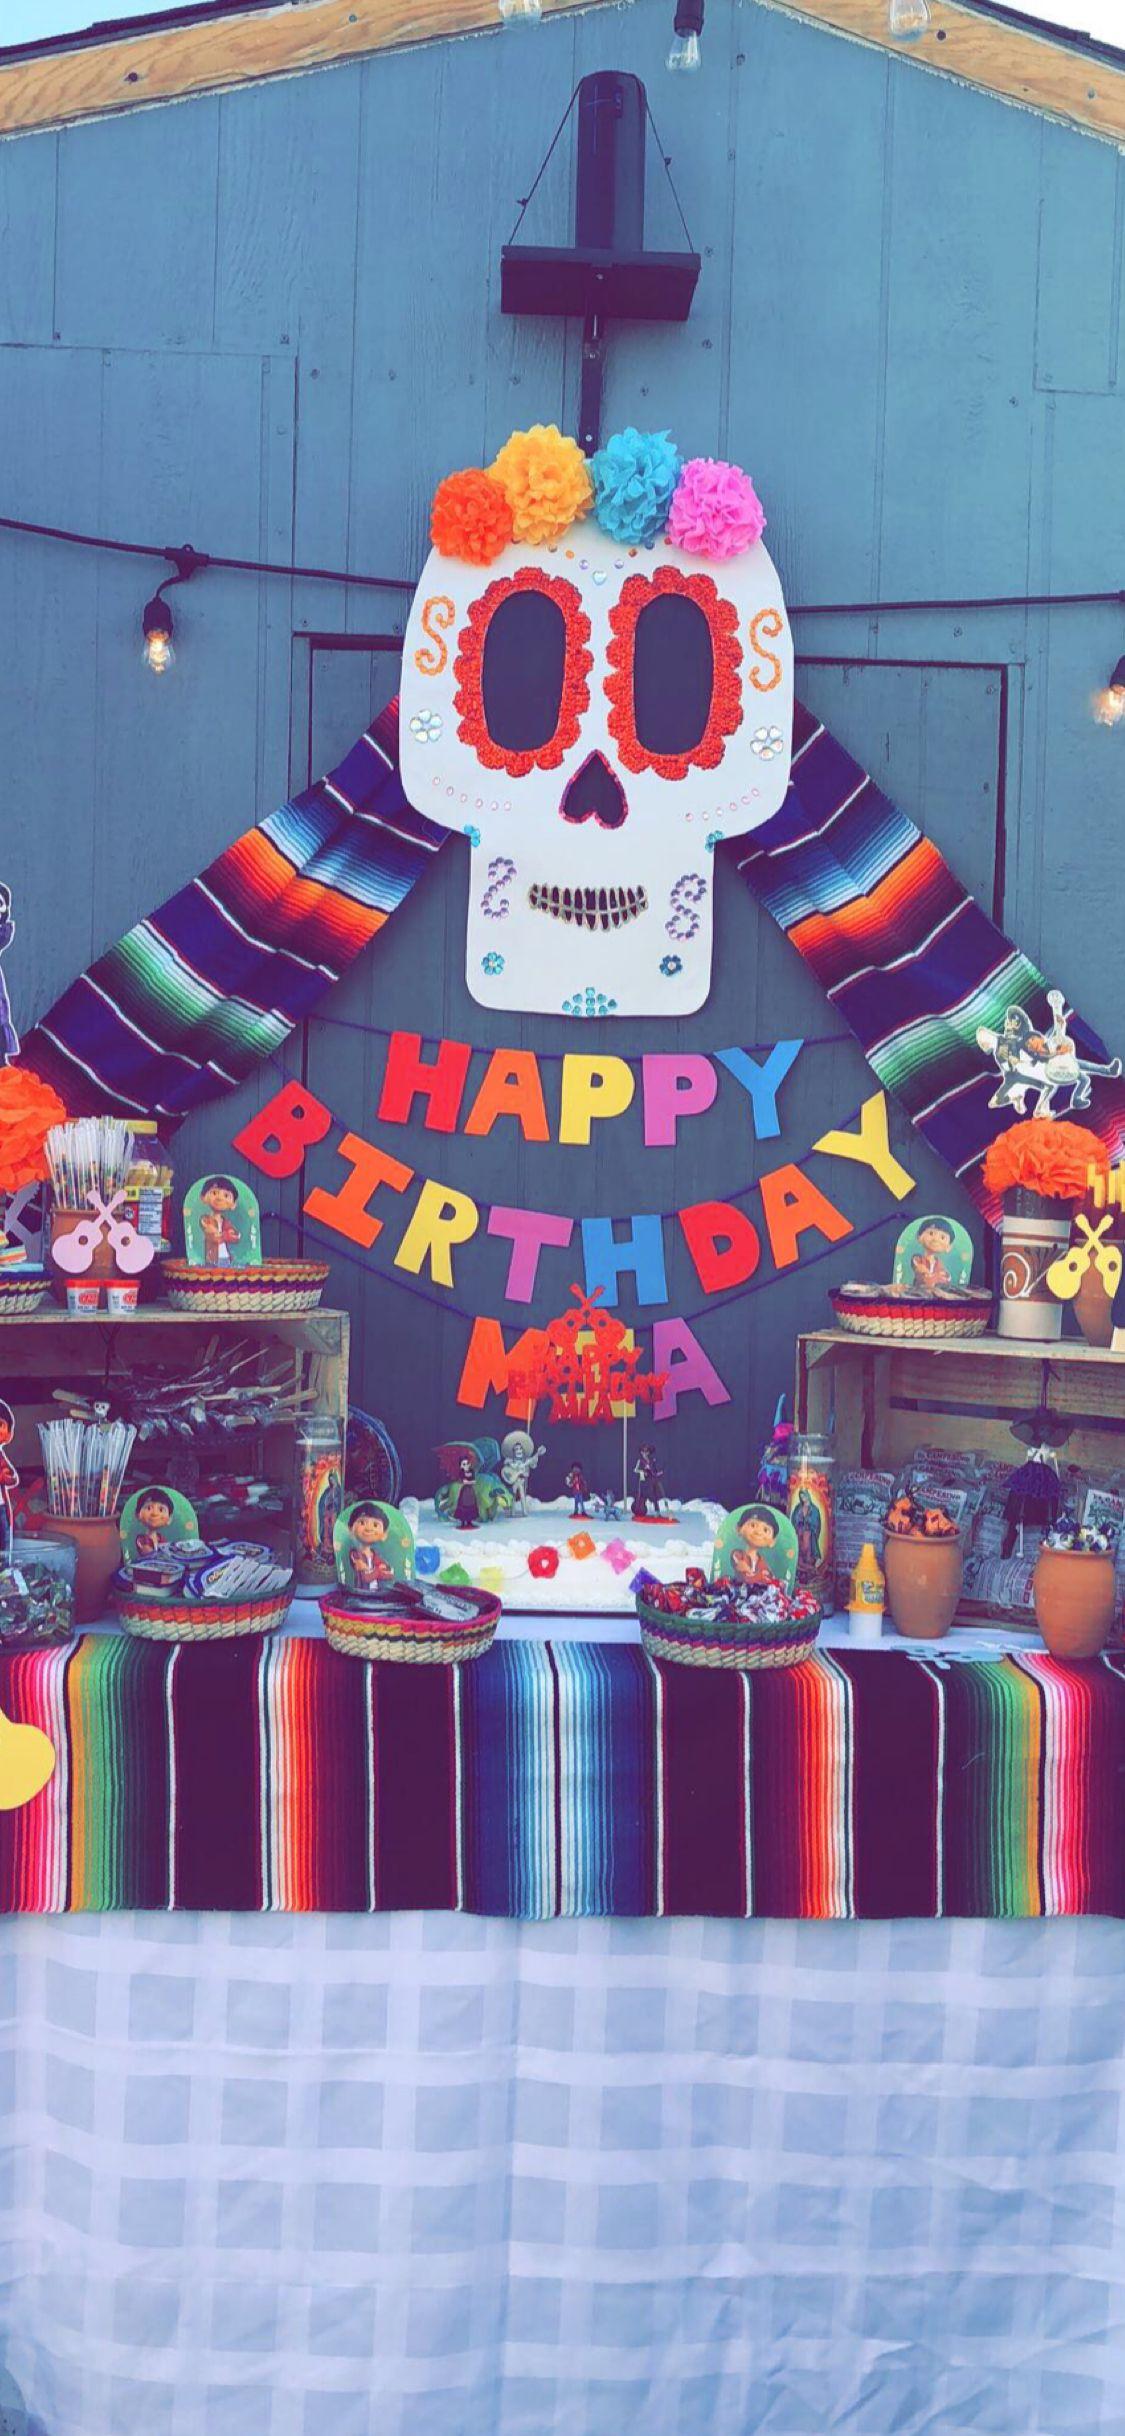 Disney Pixar Coco theme party   Fiesta México   Pinterest   disney ...